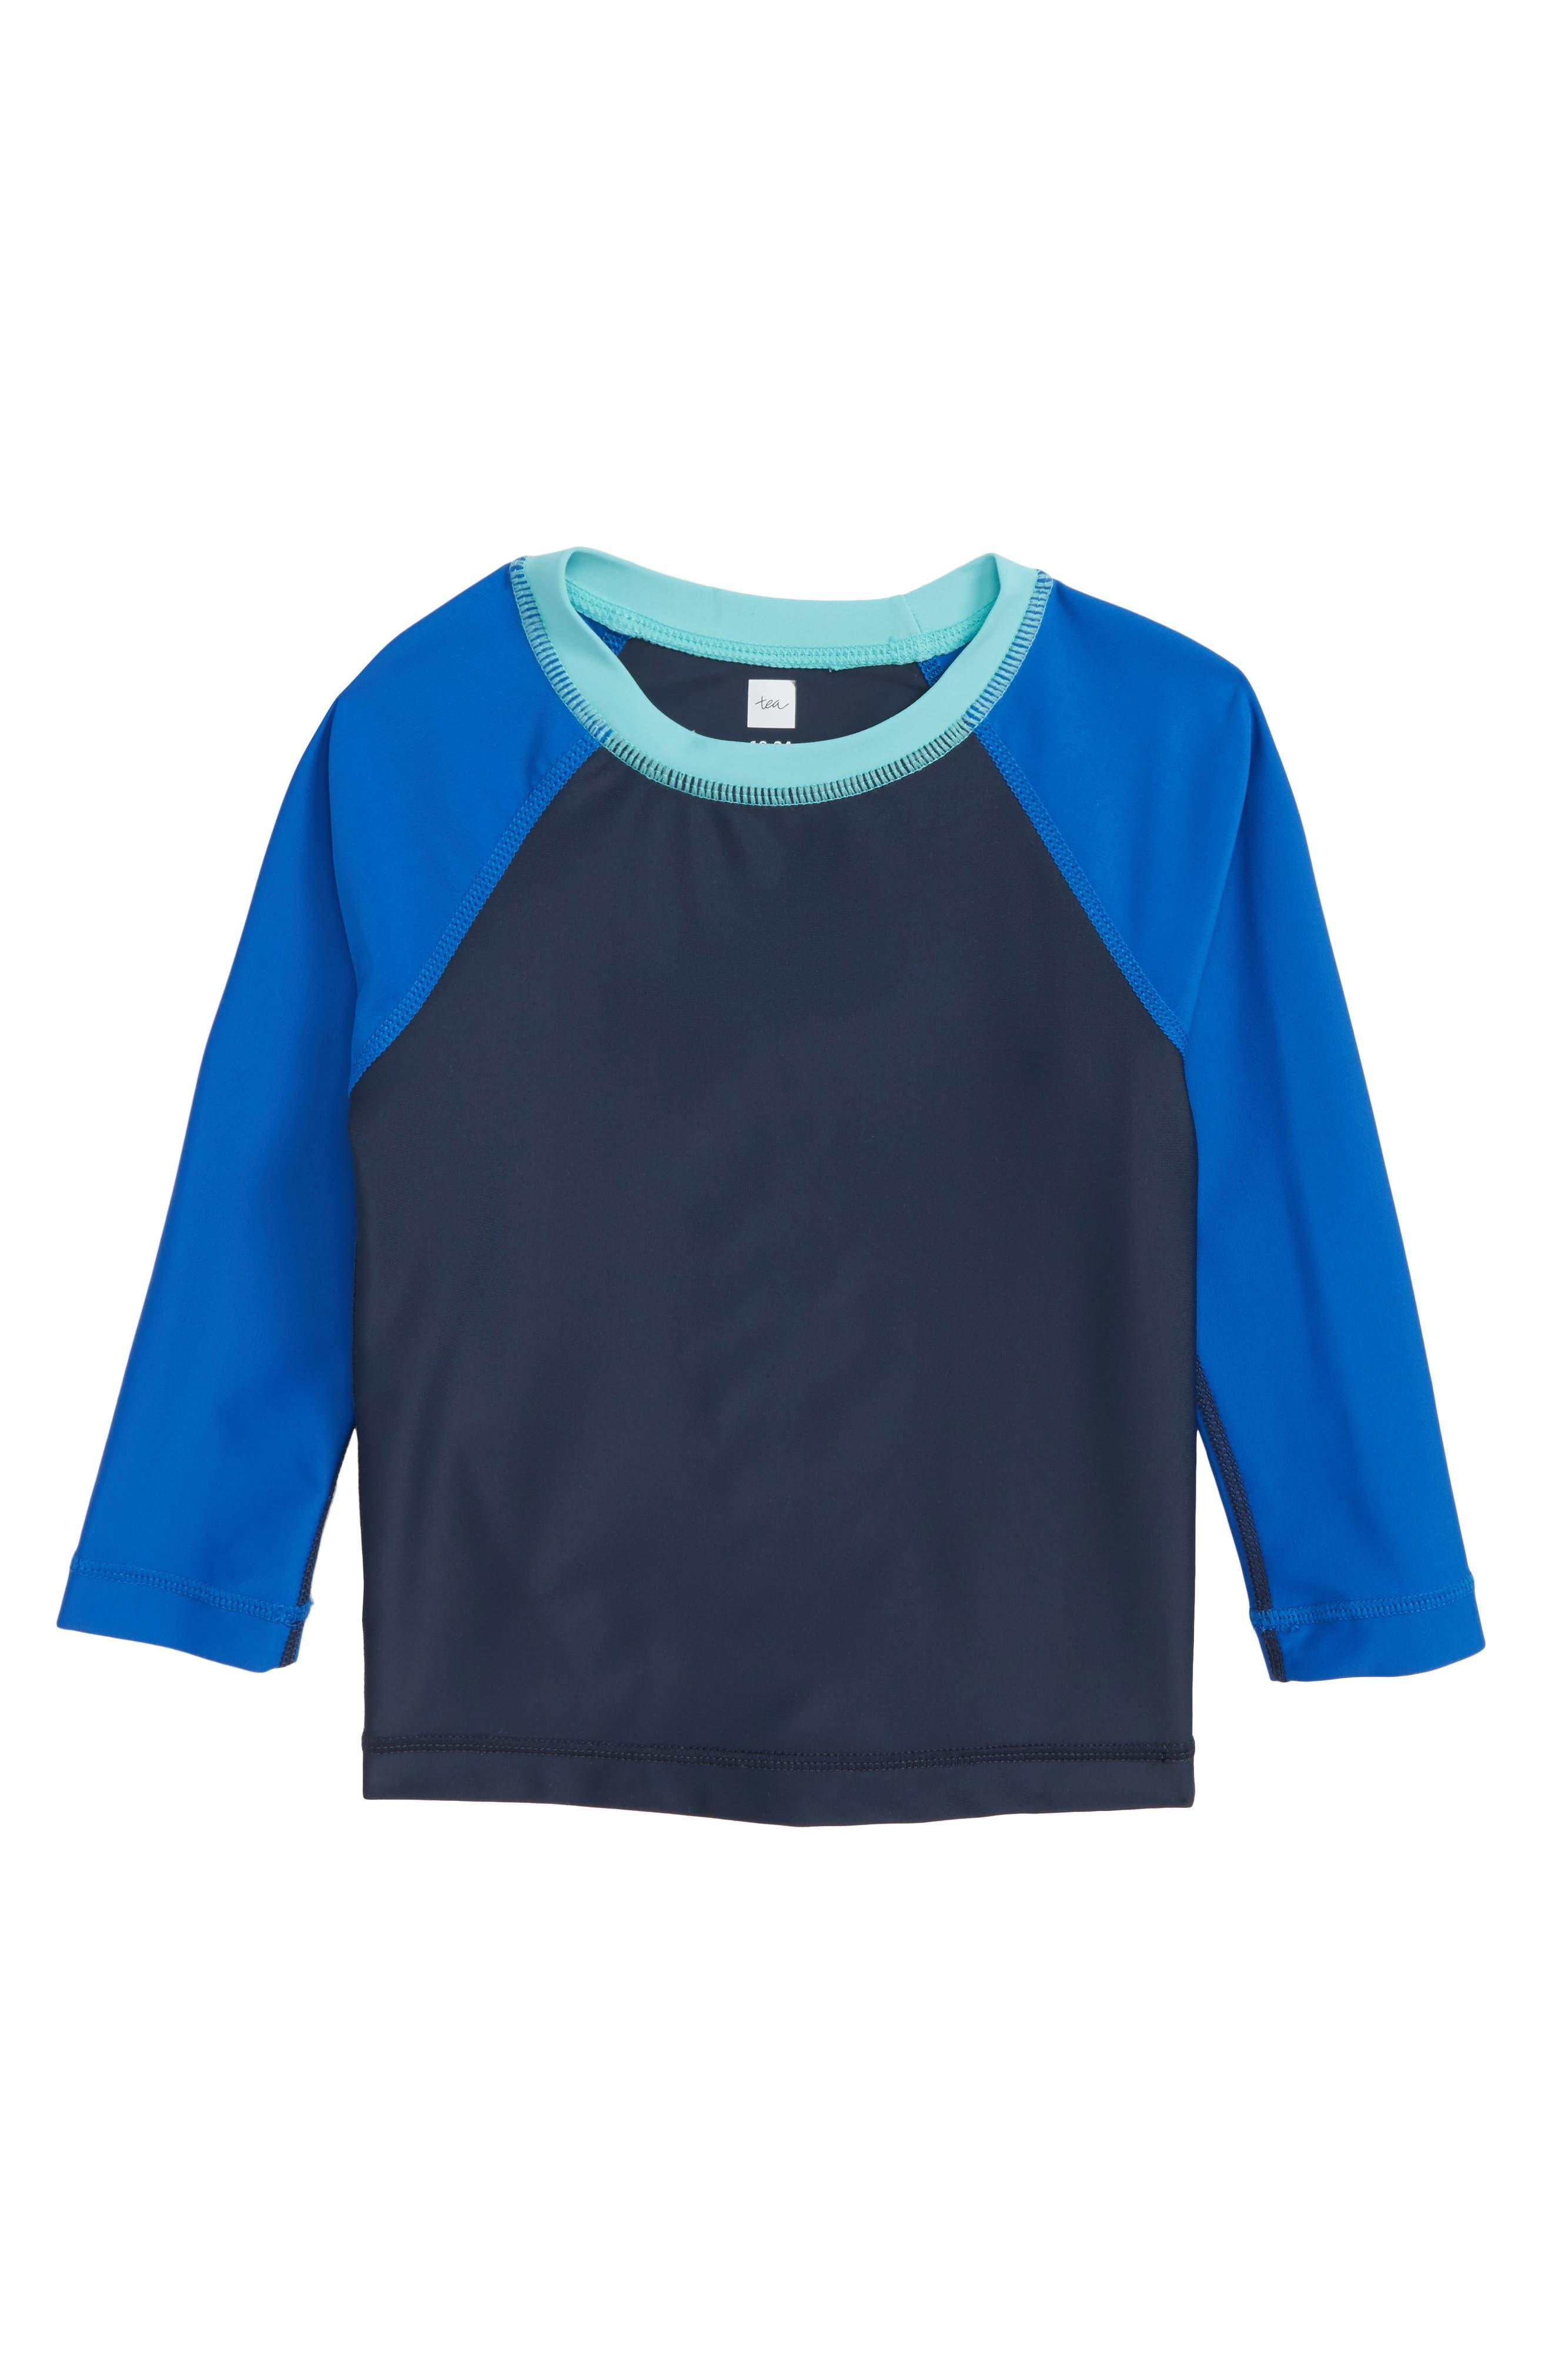 Raglan Long Sleeve Rashguard,                         Main,                         color, Indigo